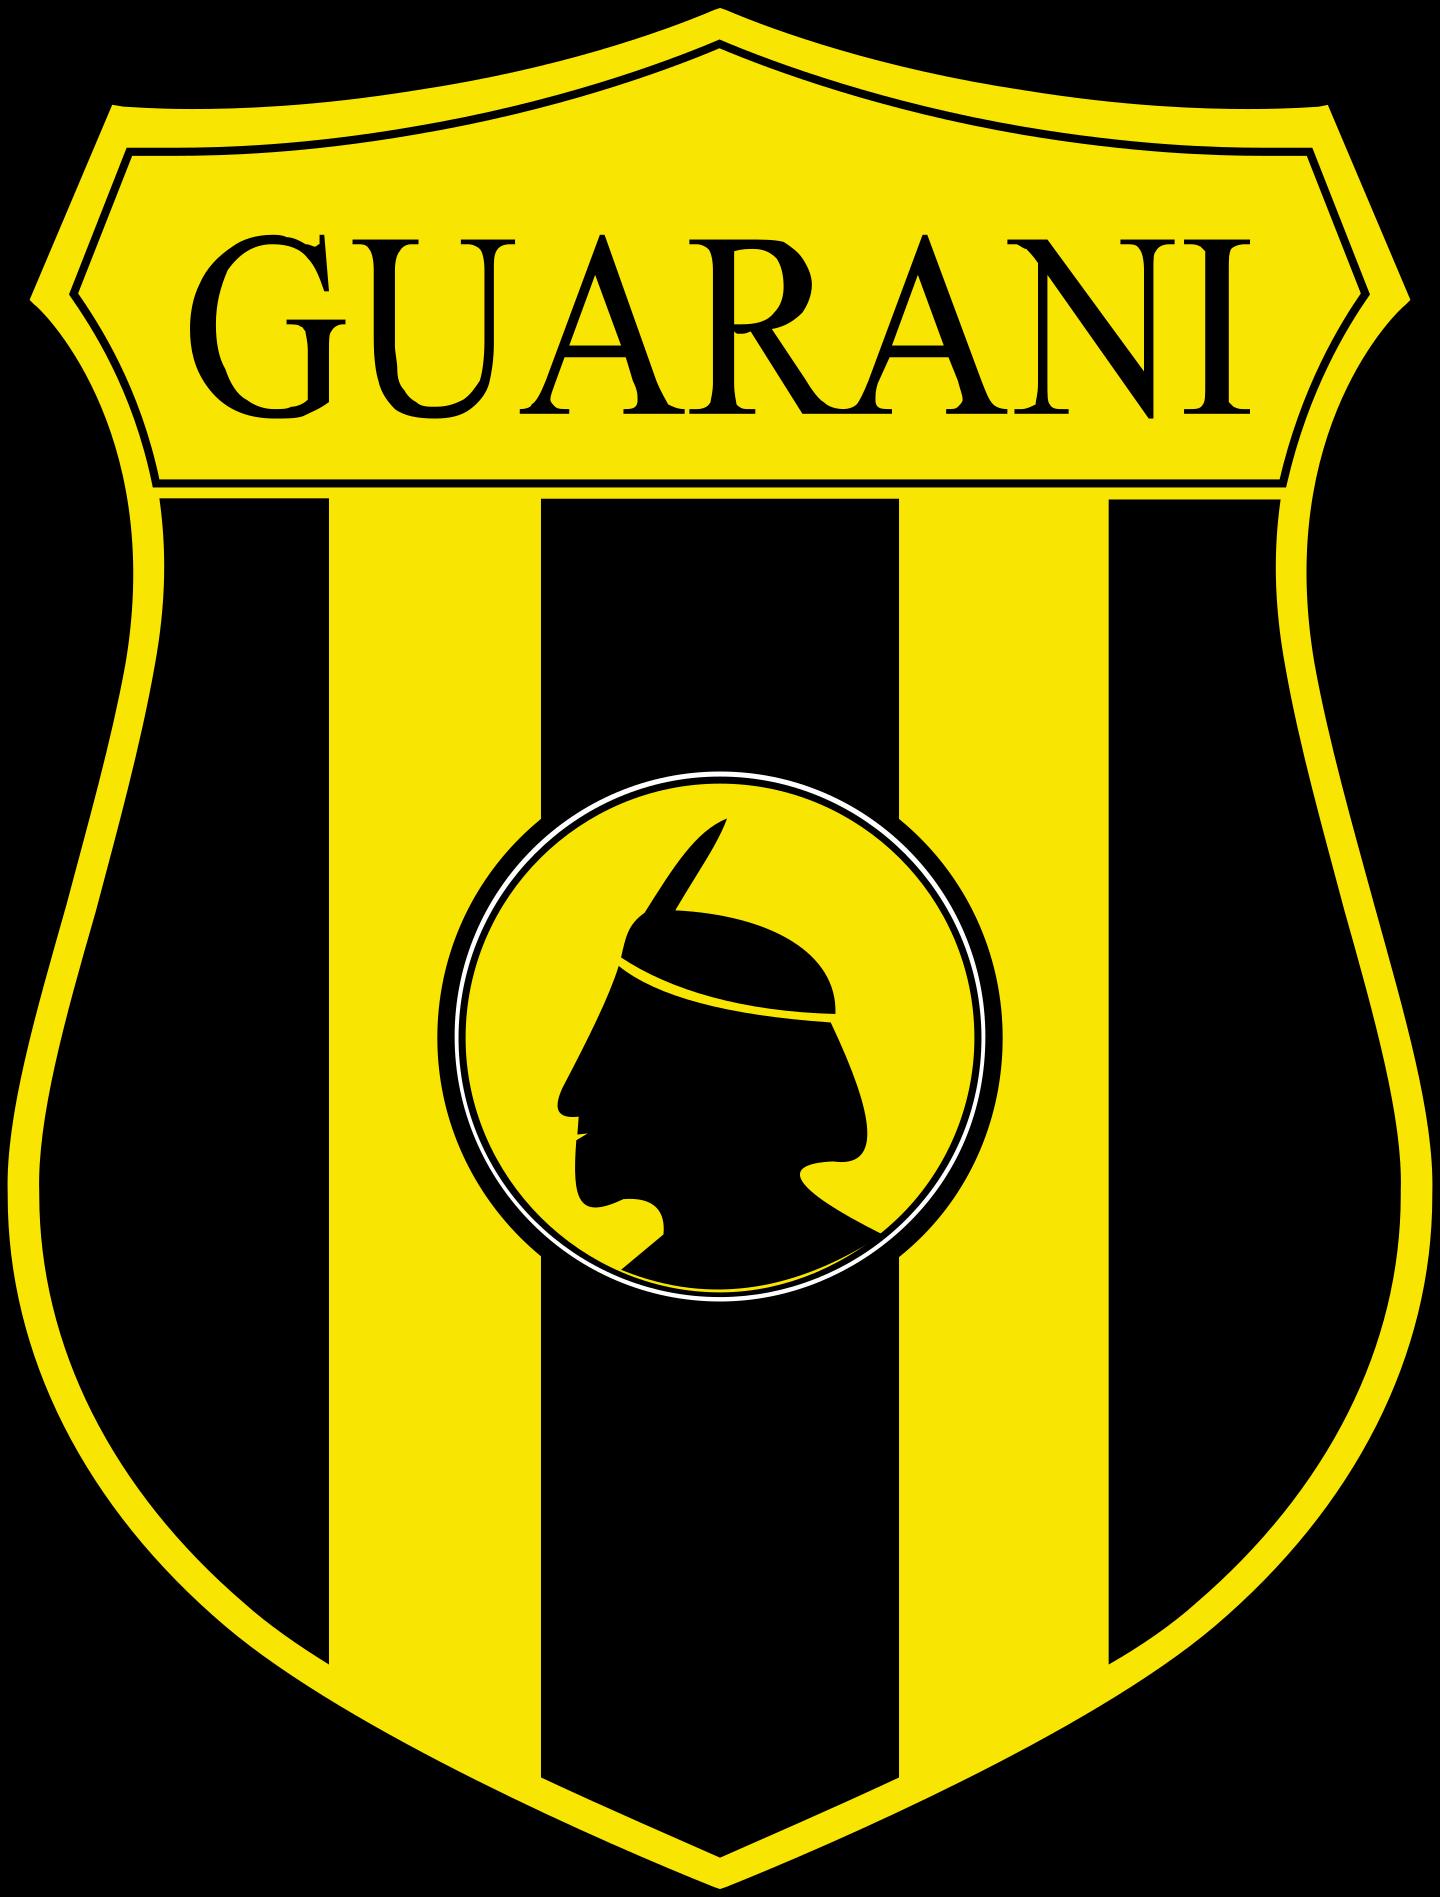 club guarani logo 2 - Club Guaraní Logo – Escudo